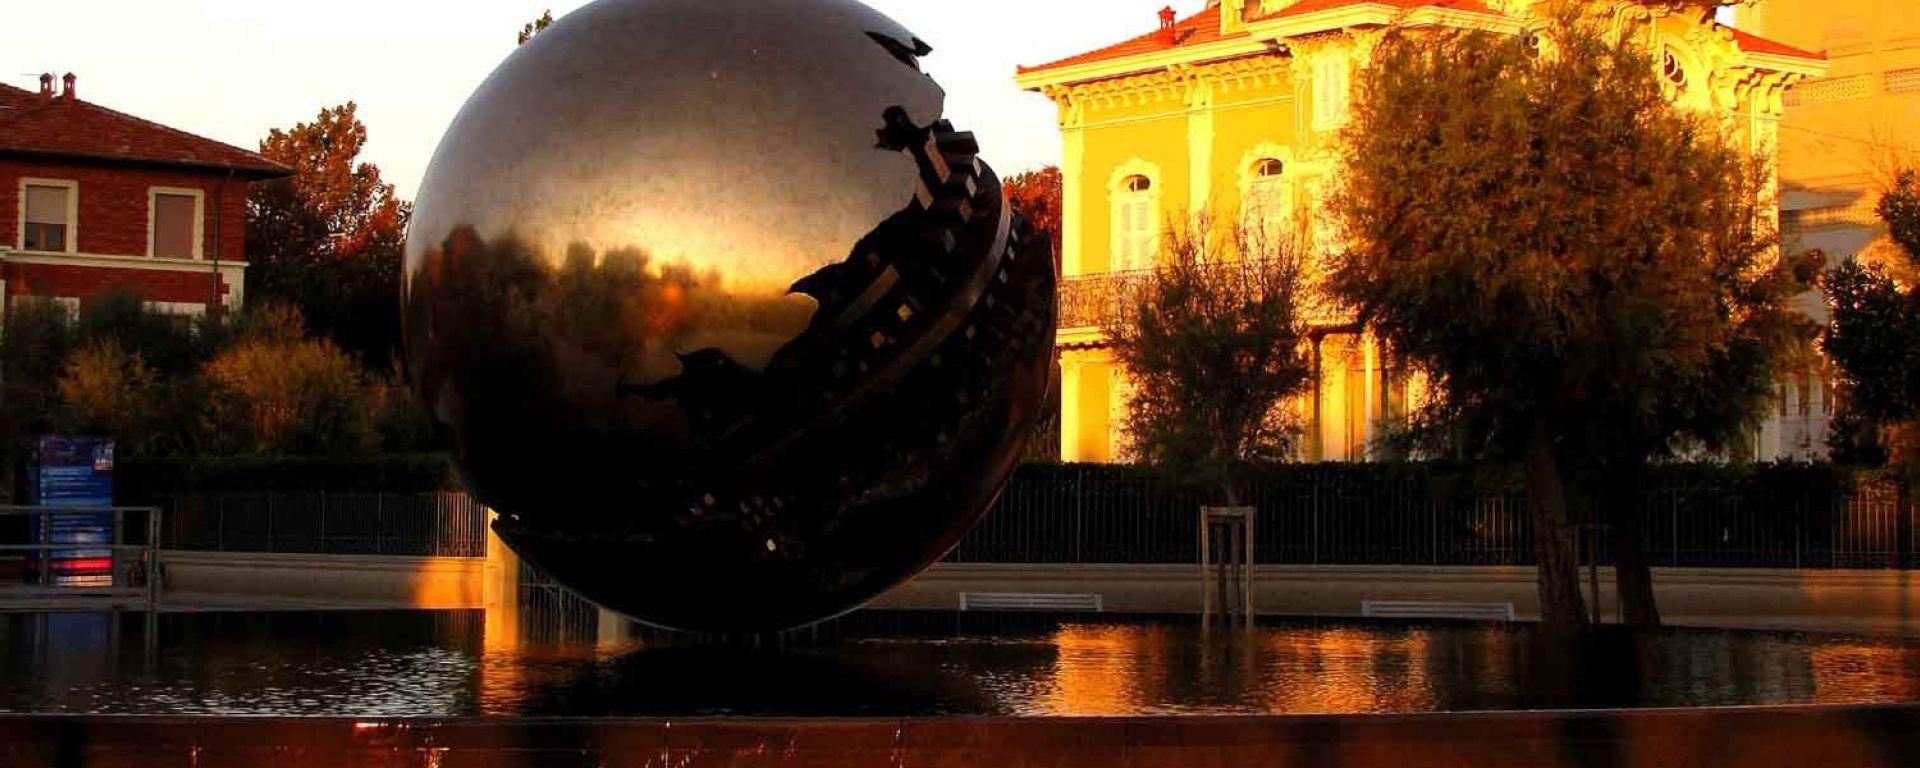 Vivere la città: Pesaro